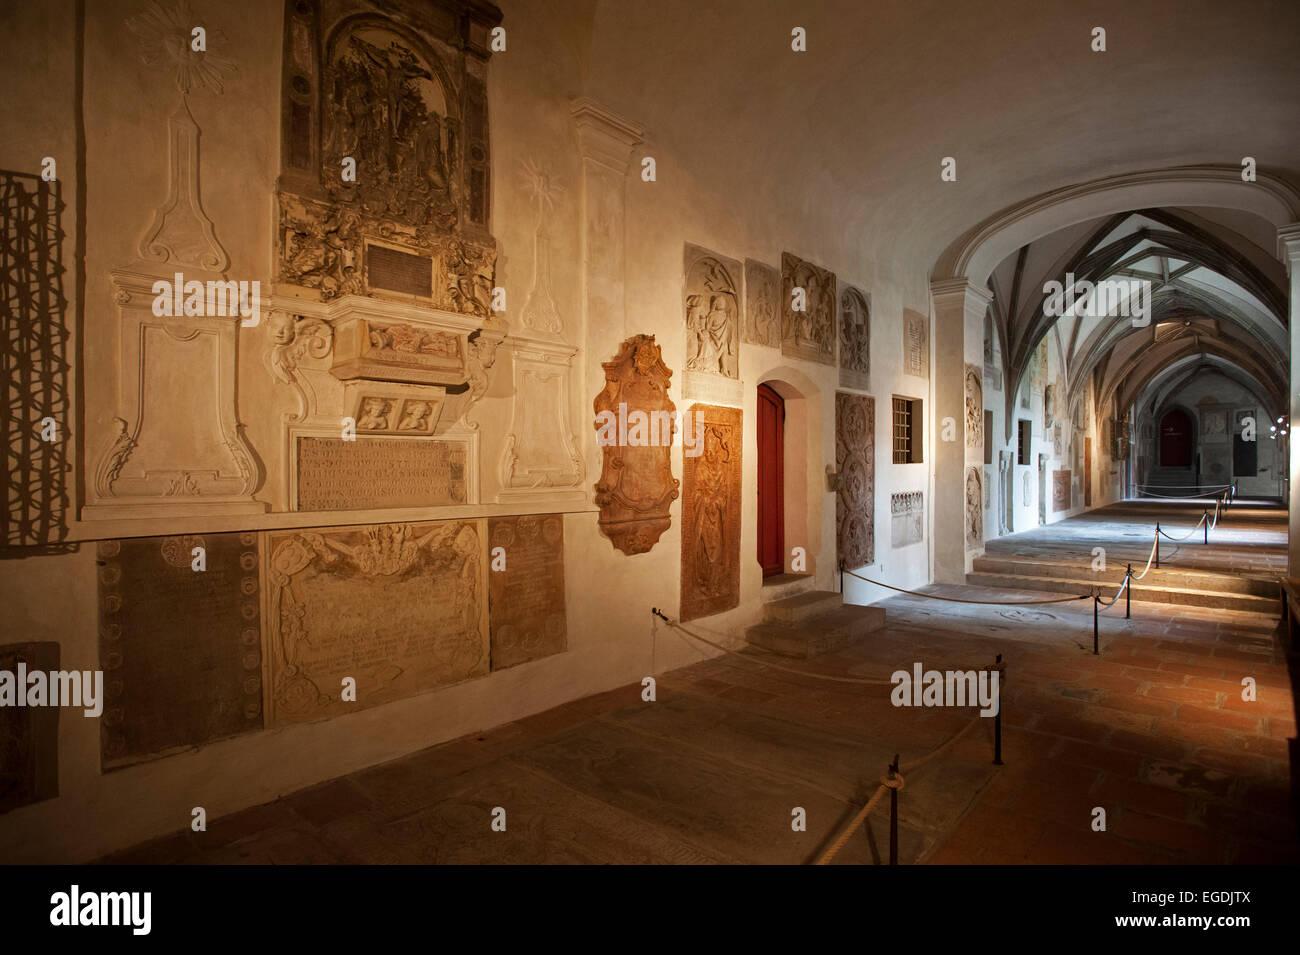 Interior of Augsburg cathedral, Augsburg, Swabia, Bavaria, Germany - Stock Image